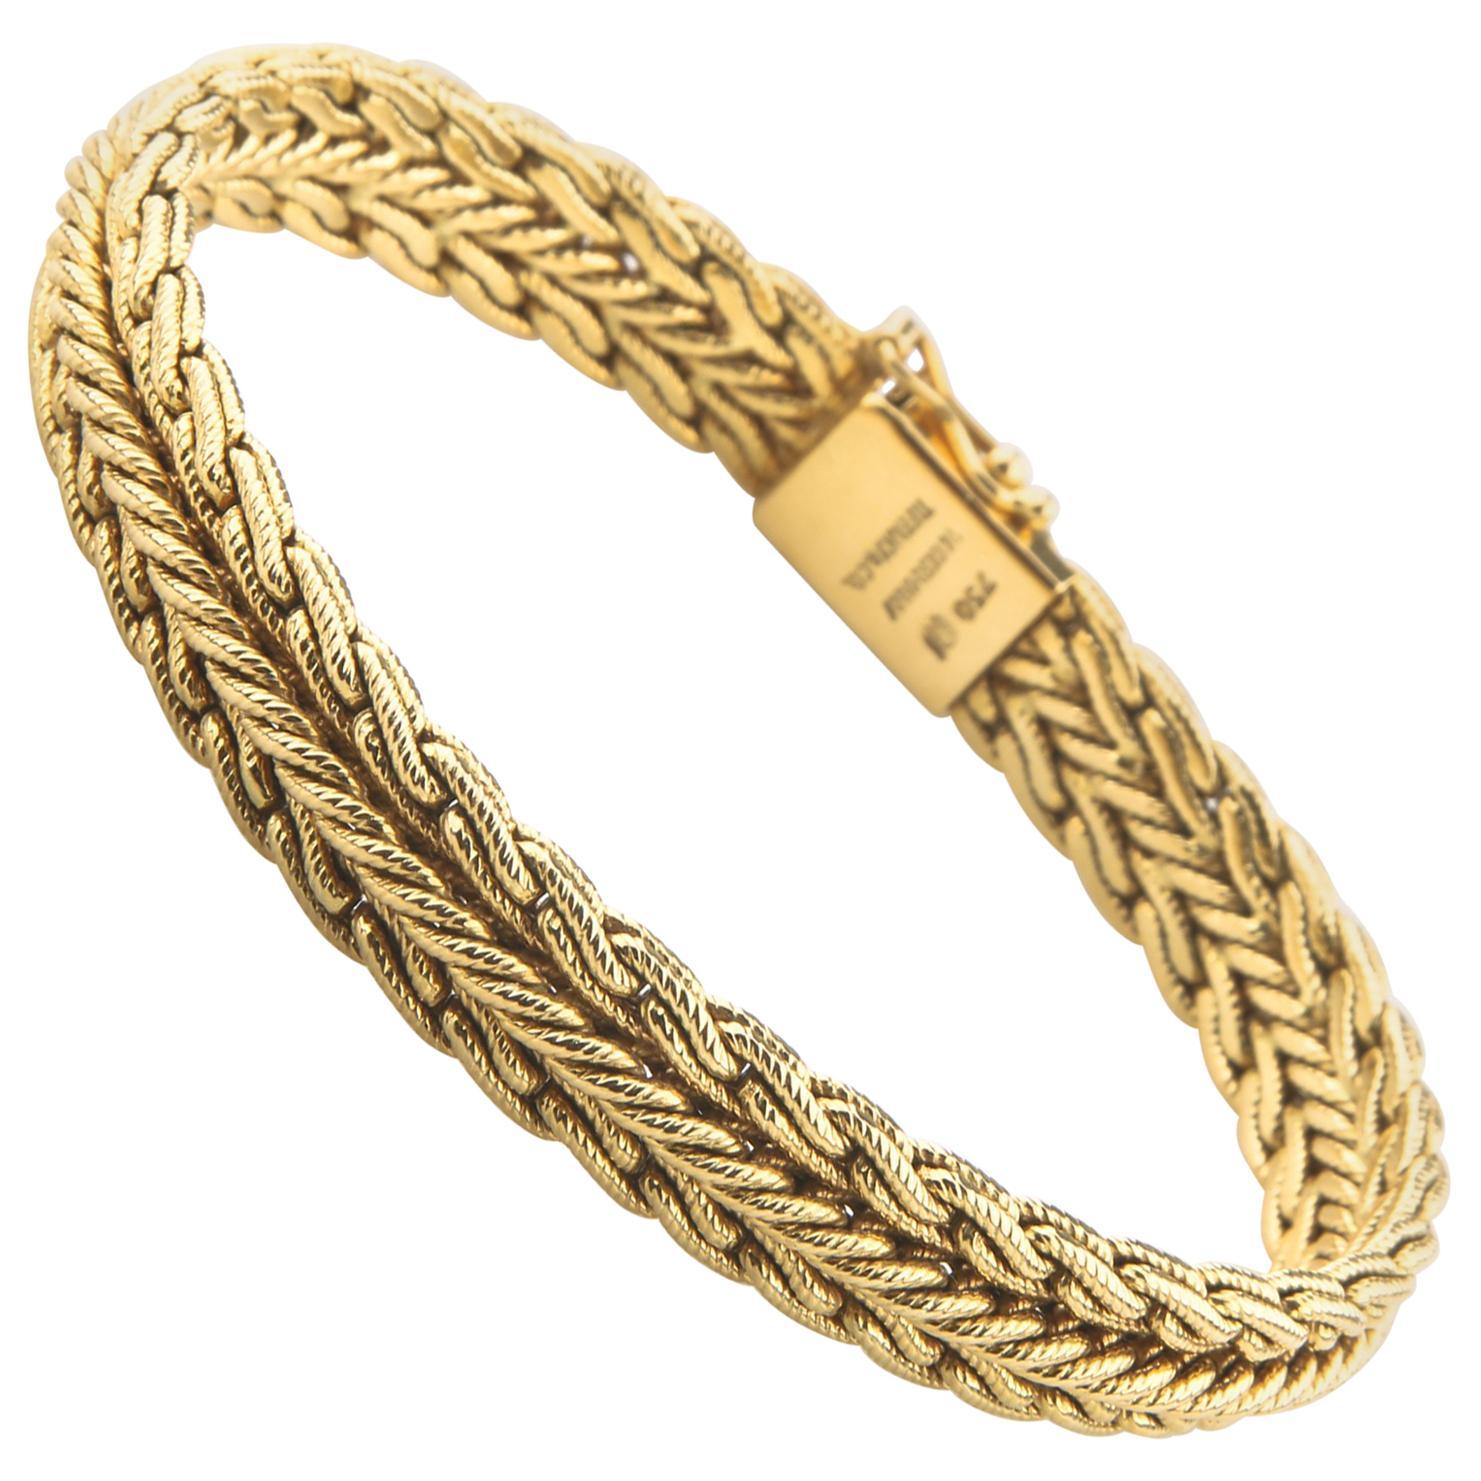 Tiffany & Co. Vintage 18 Karat Yellow Gold Woven Mesh Bracelet W. Germany